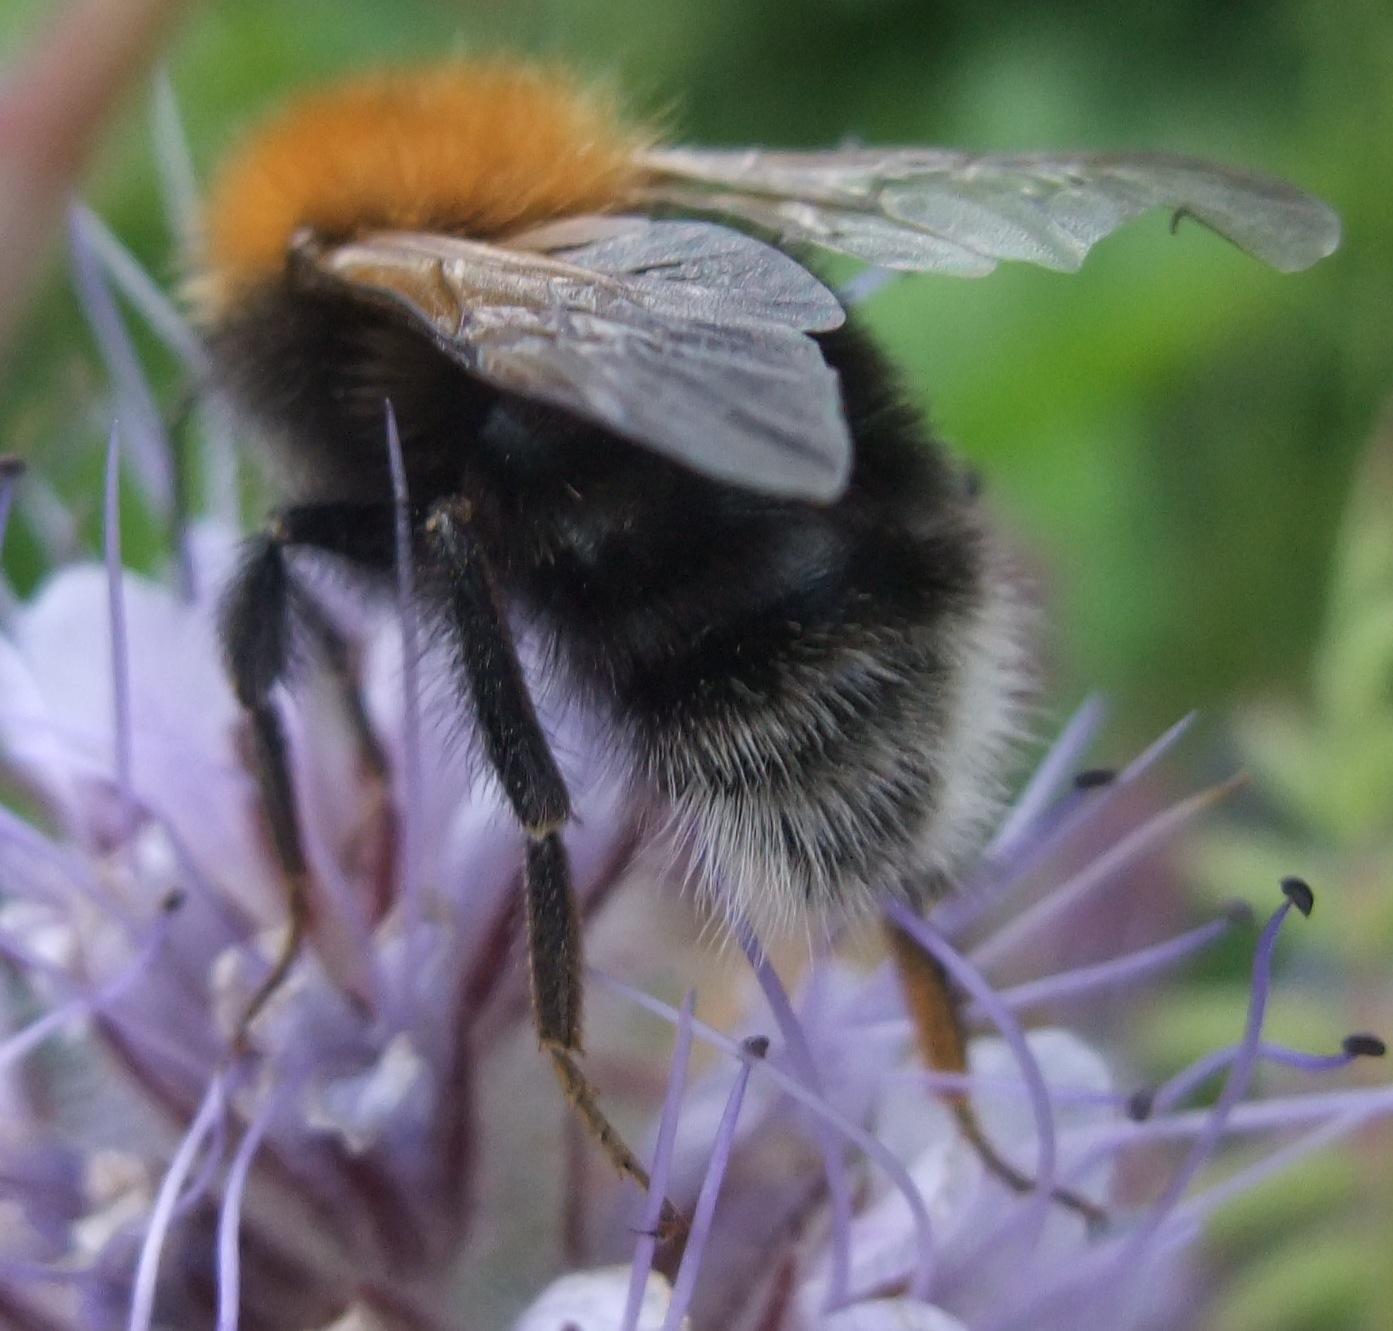 brigit strawbridge which bees u0027sting u0027 and which don u0027t